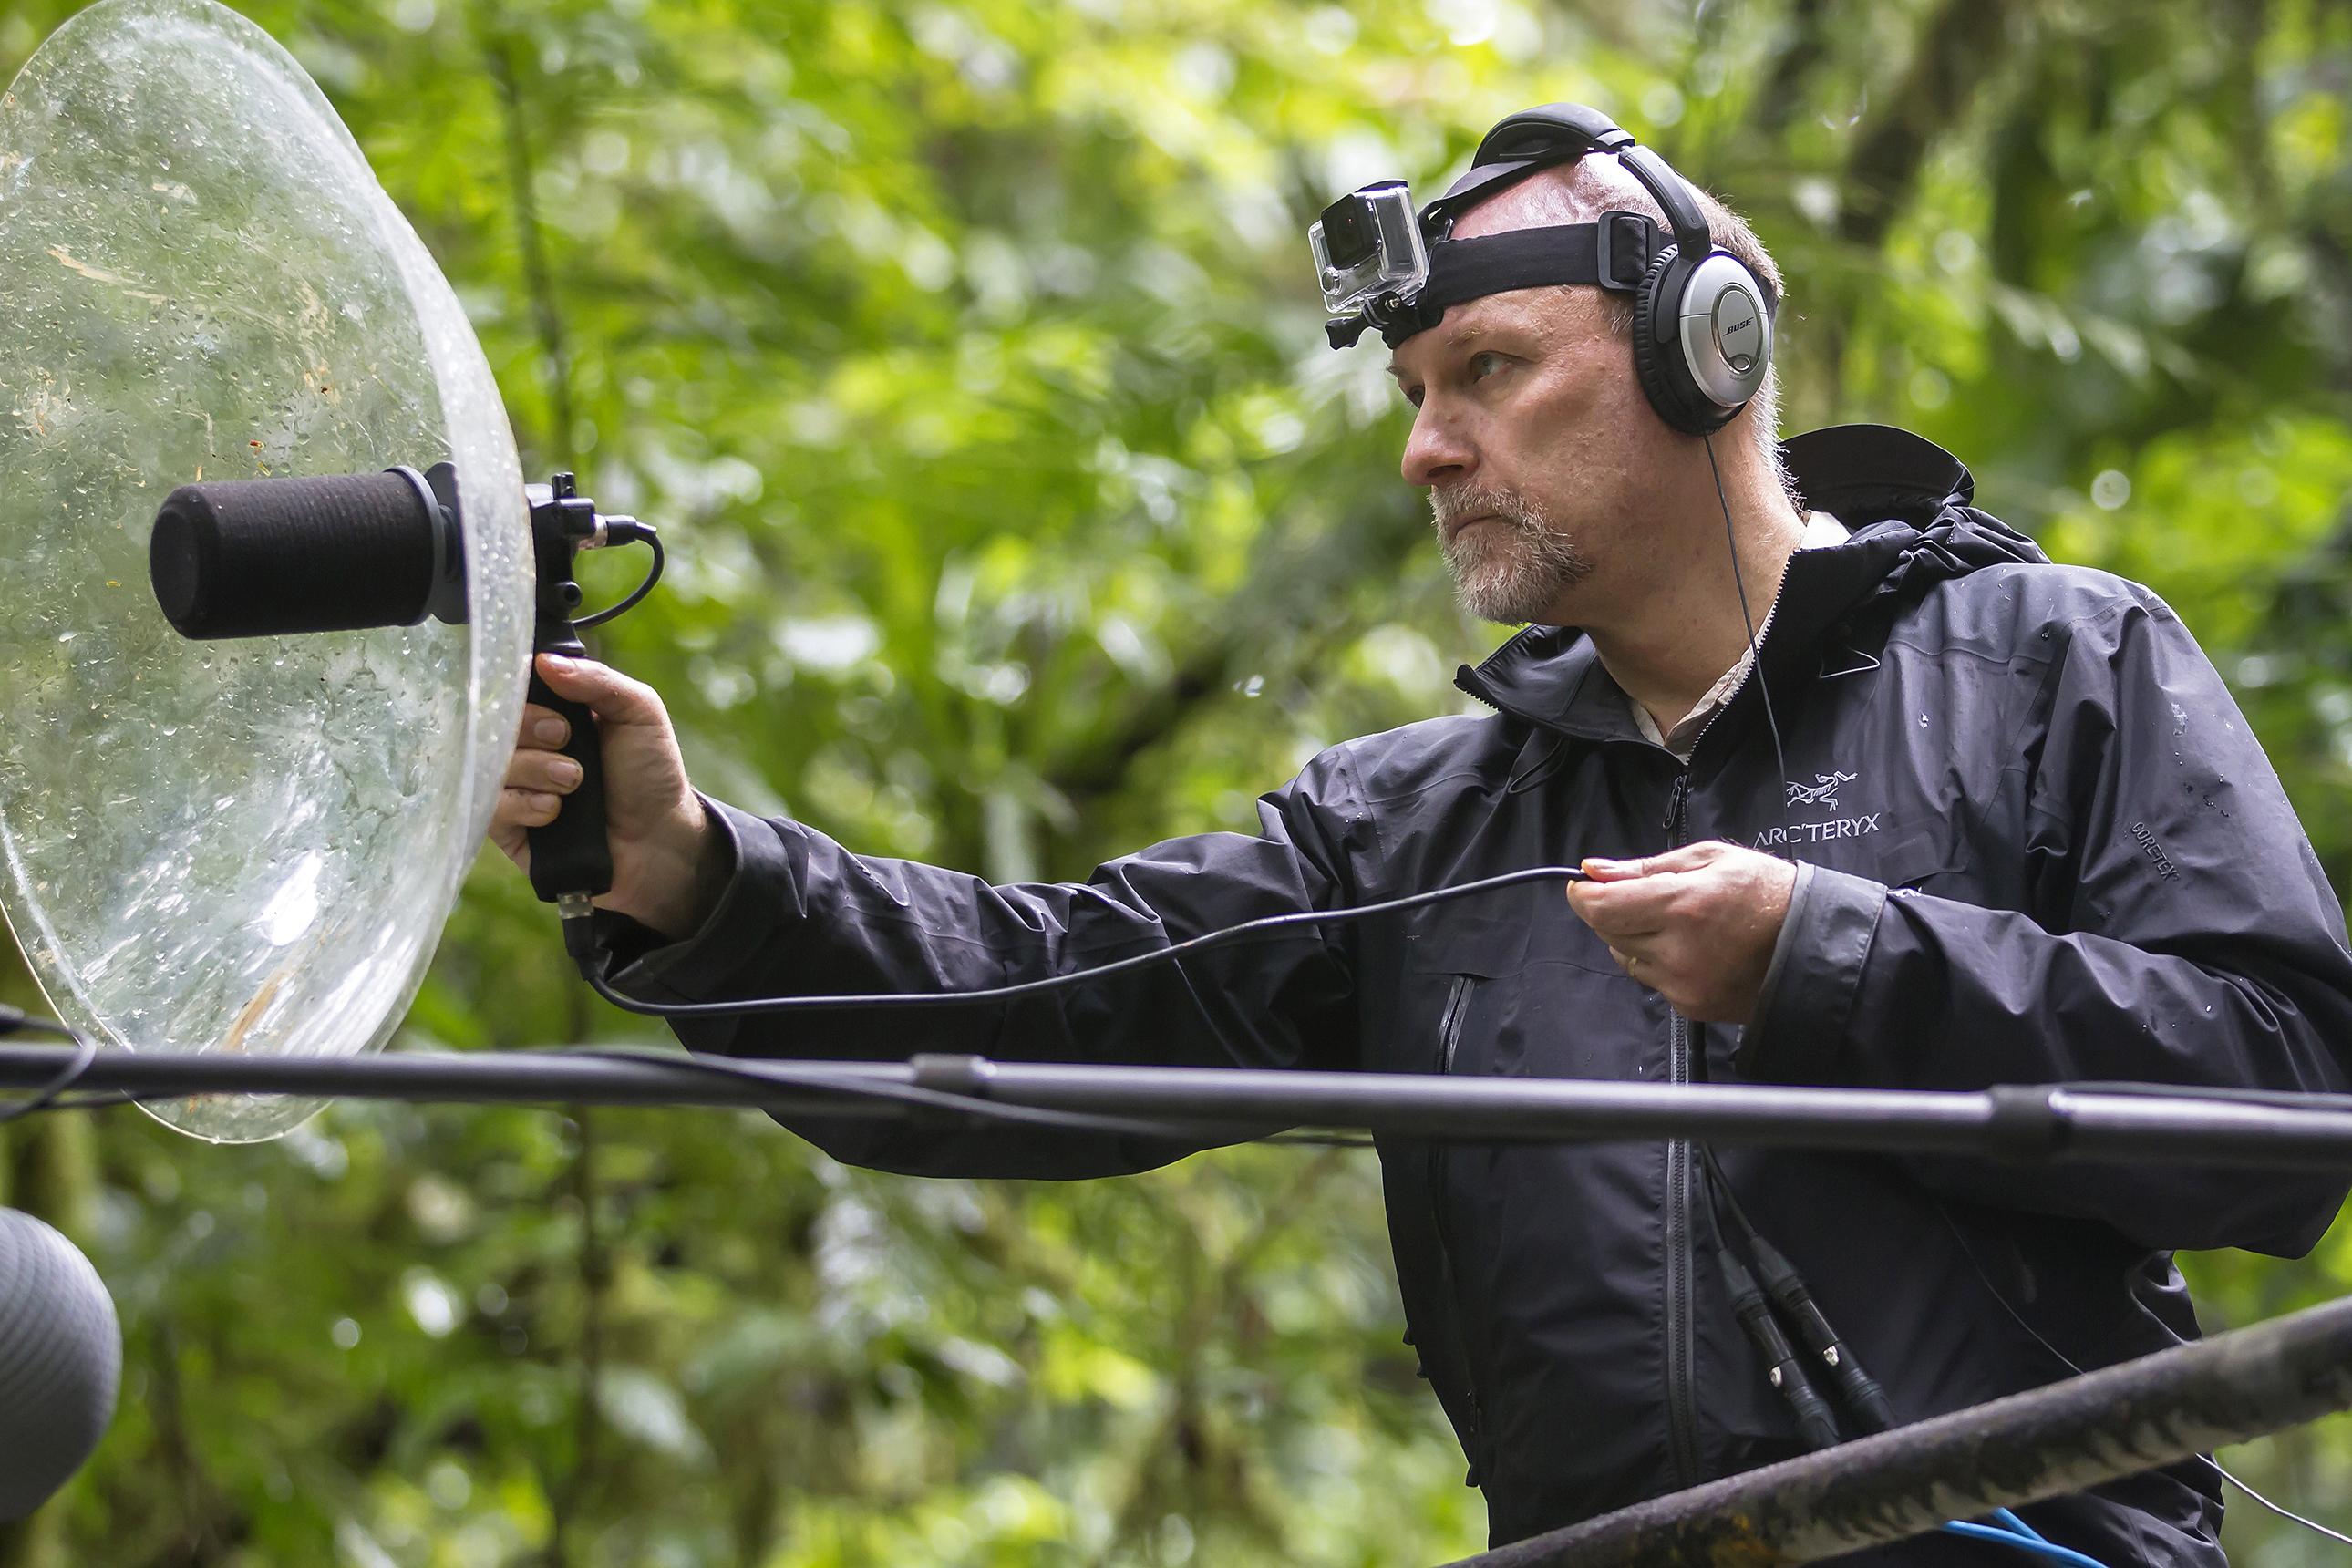 Bryan Pijanowski uses parabolic microphone to listen to nature.